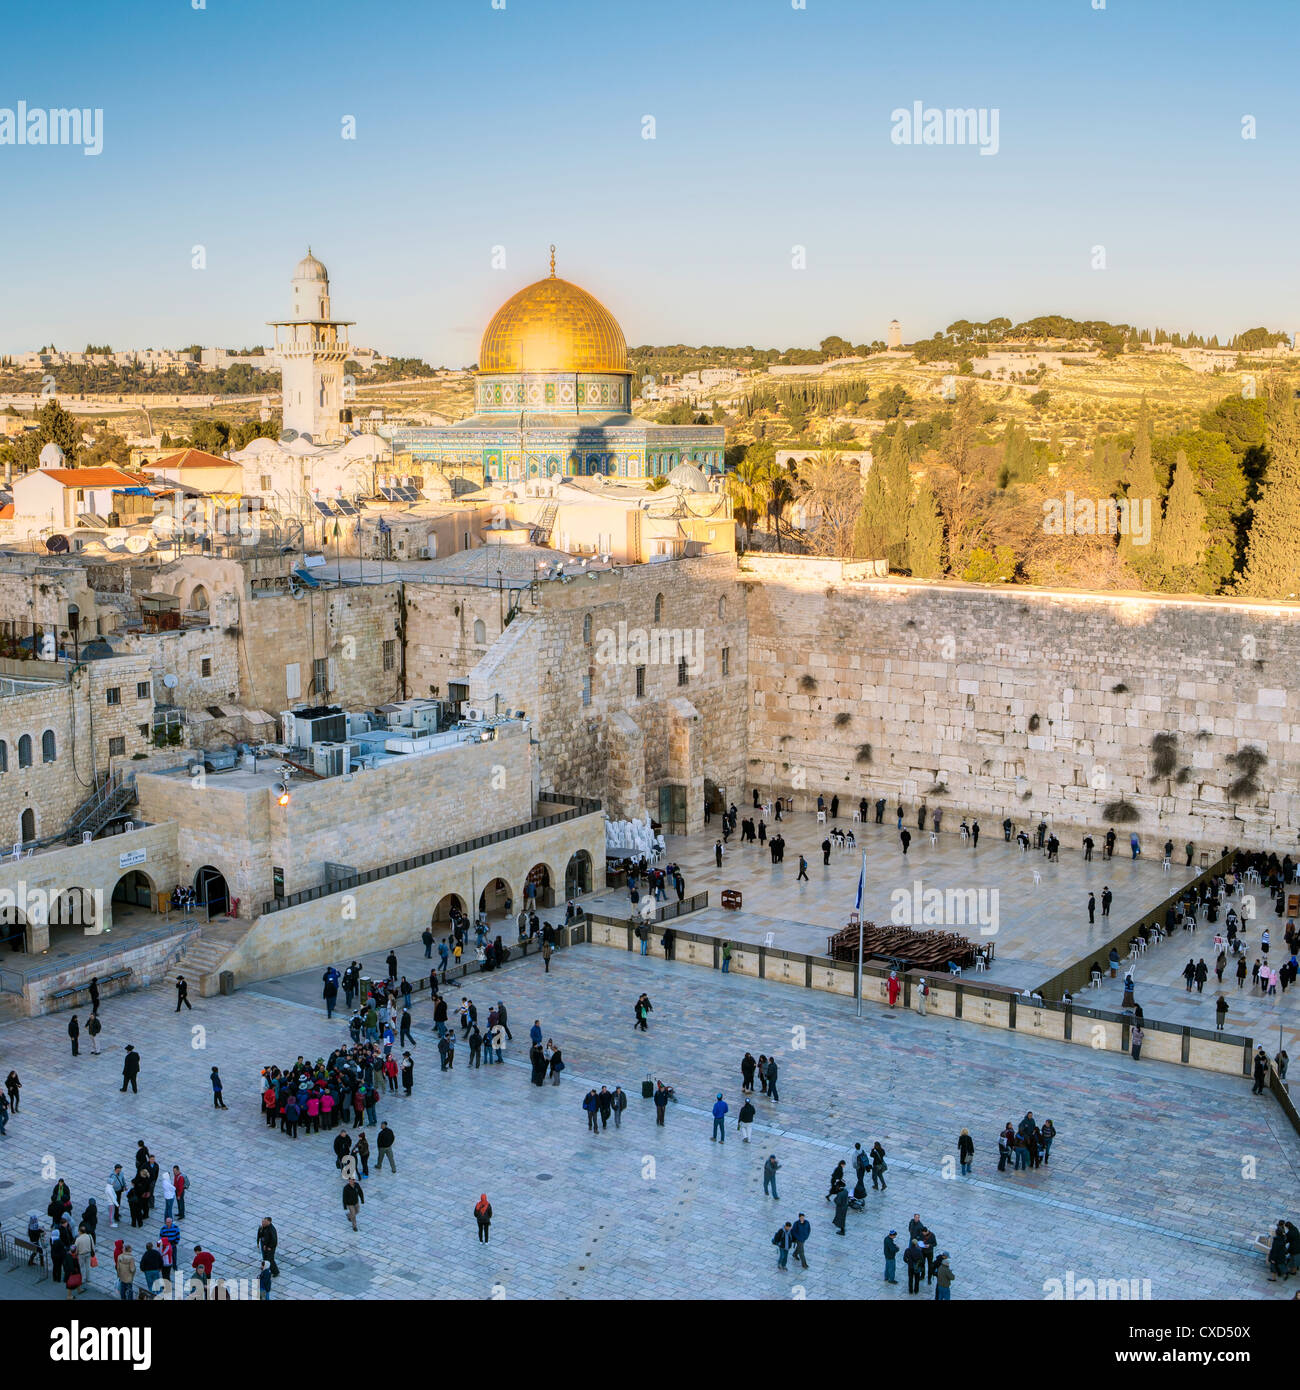 Judenviertel von Western Wall Plaza, Altstadt, UNESCO World Heritage Site, Jerusalem, Israel, Nahost Stockbild